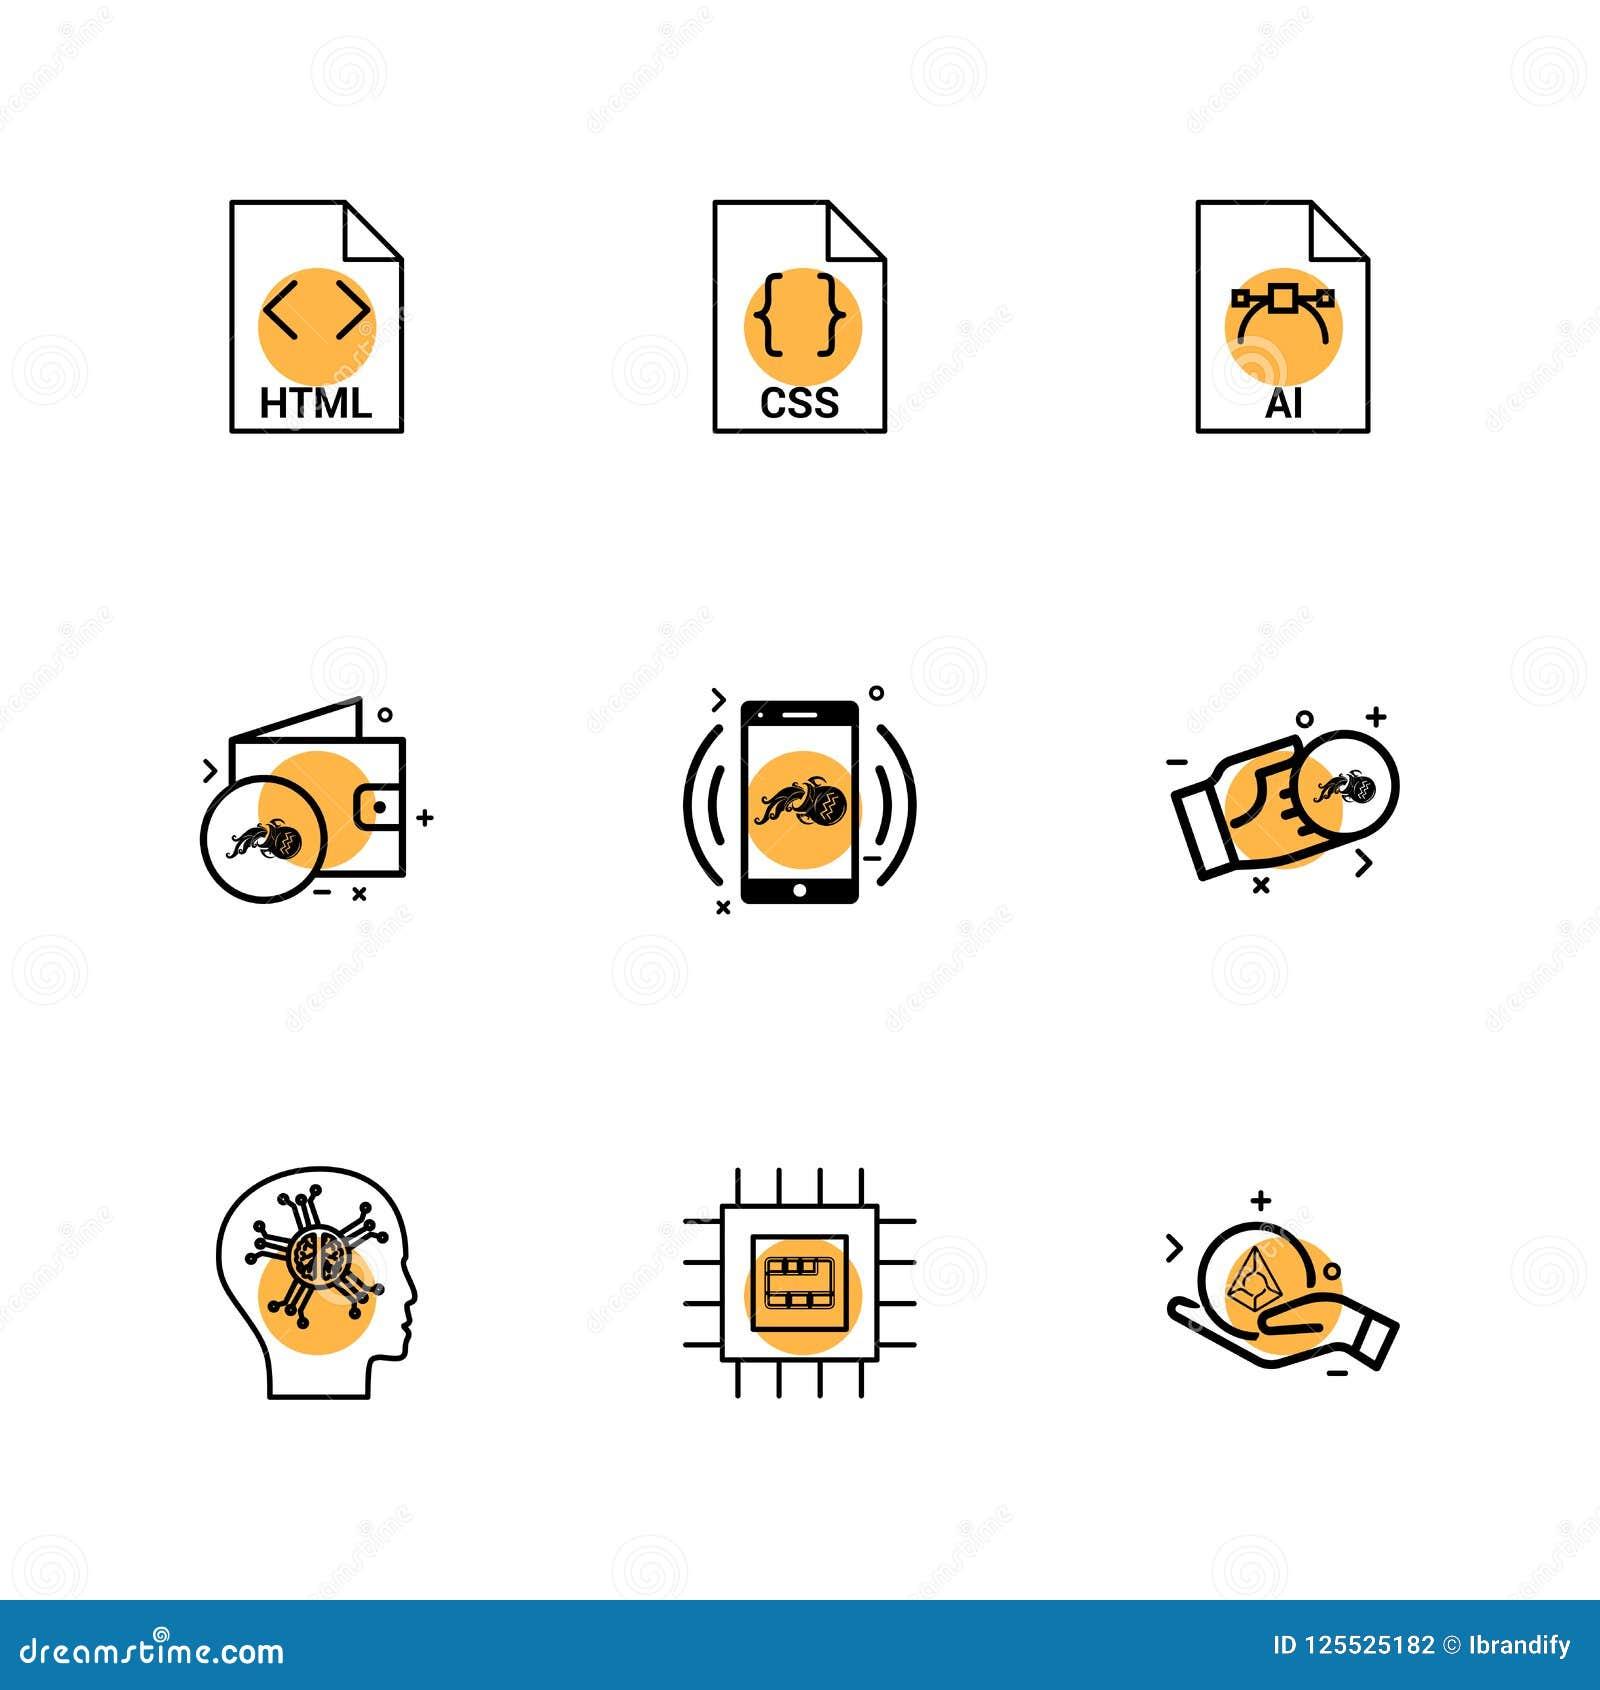 HTML, css, AI, πορτοφόλι, κινητός, crypto νόμισμα, χρήματα, ολοκληρωμένο κύκλωμα,